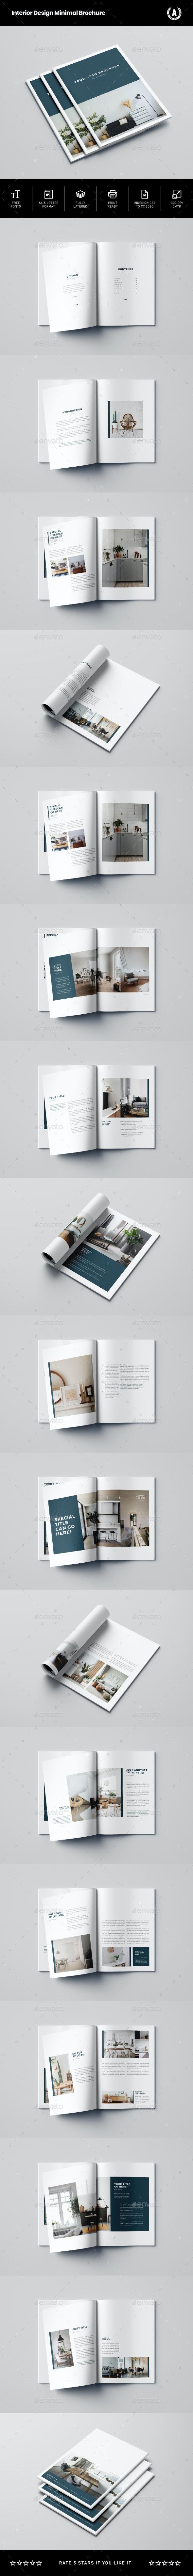 Interior Design Minimal Brochure - Brochures Print Templates